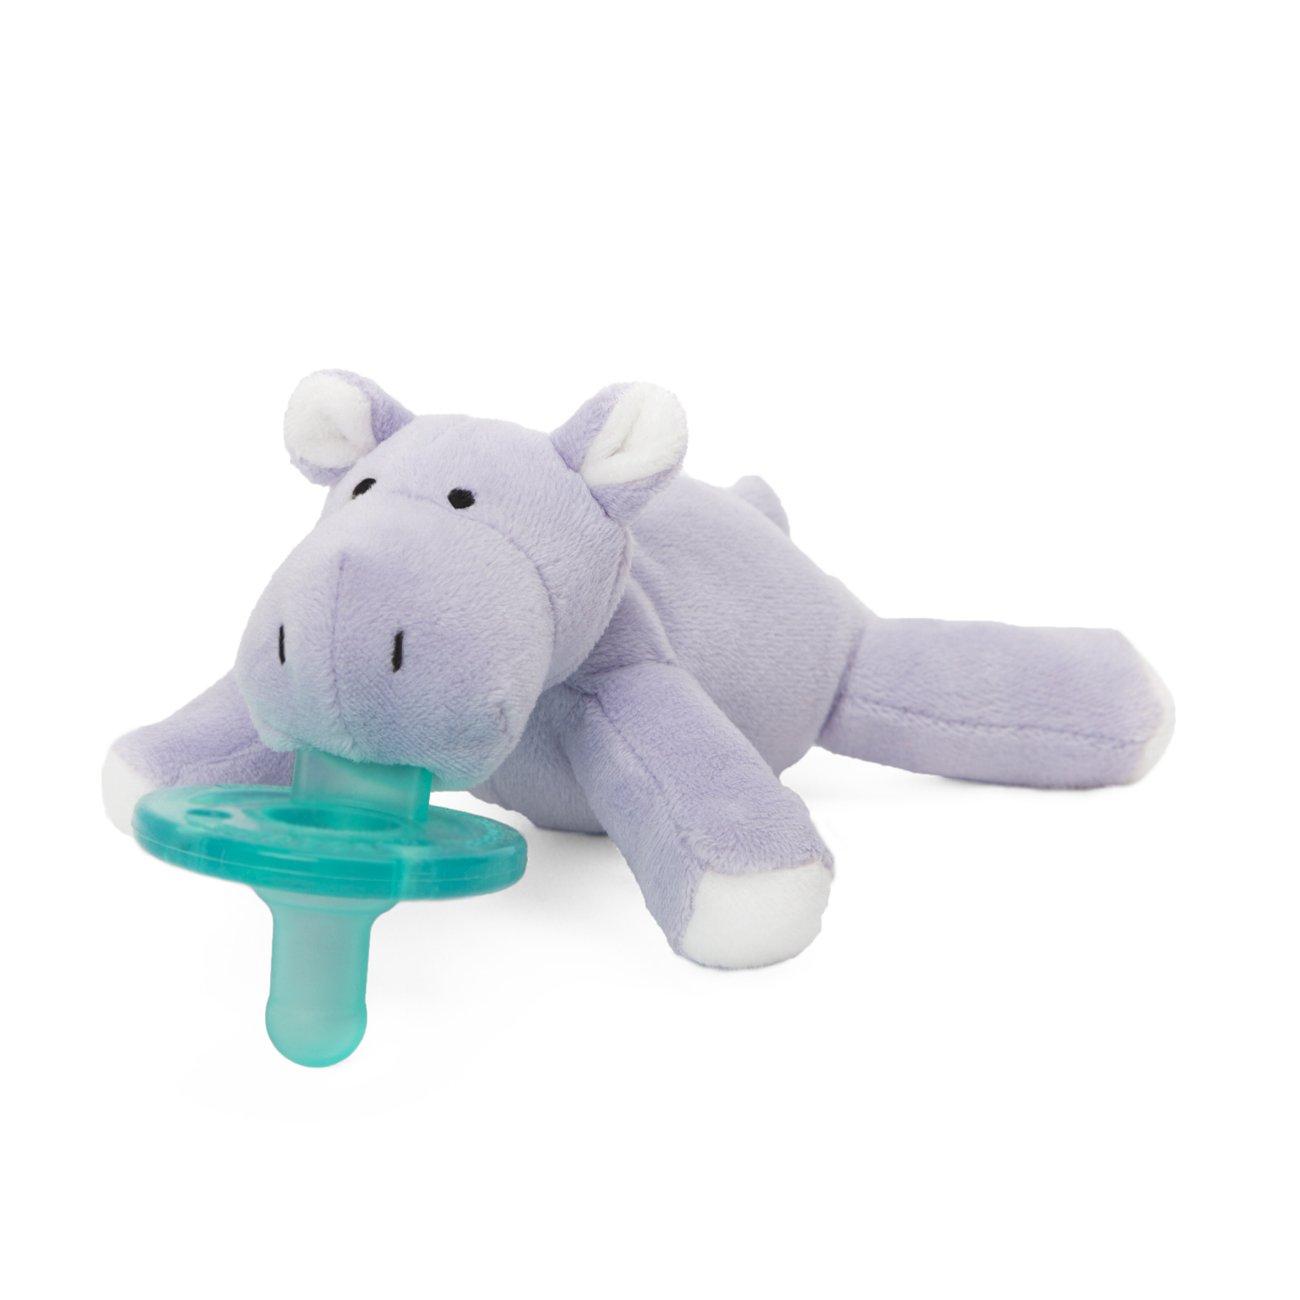 Amazon.com : Wubbanub Infant Pacifier - Hippo : Baby